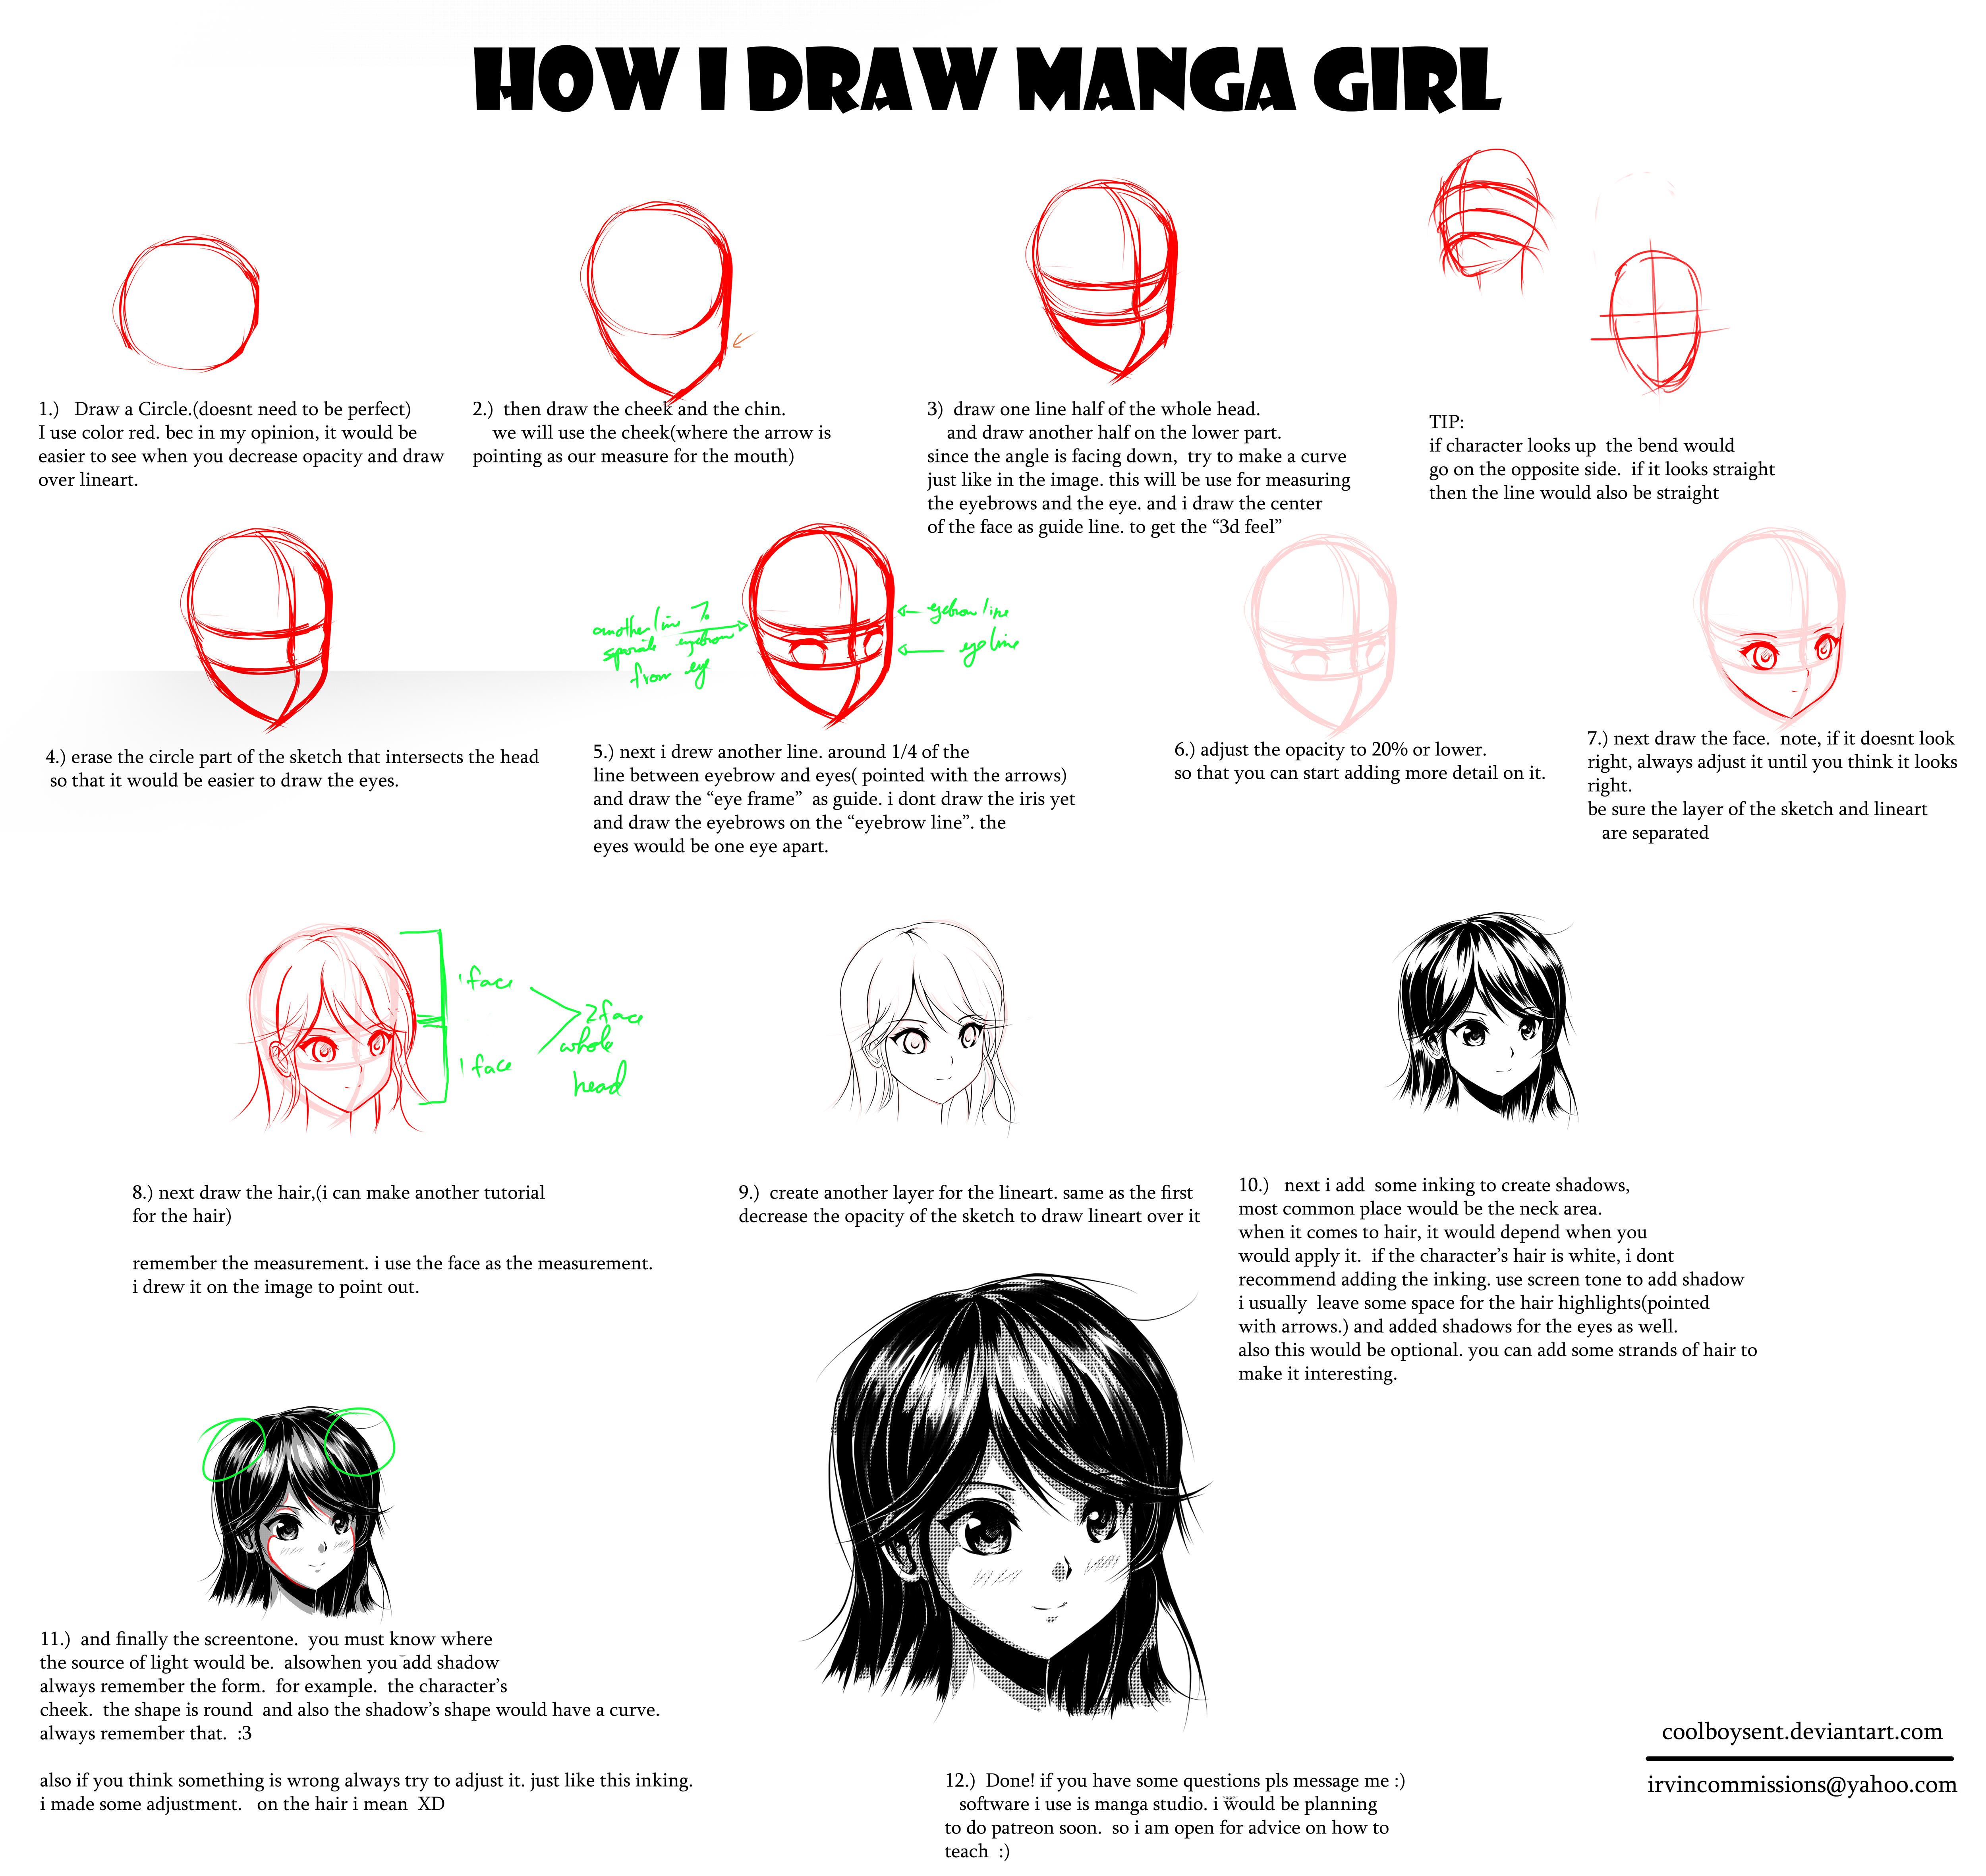 HOW I DRAW MANGA GIRL